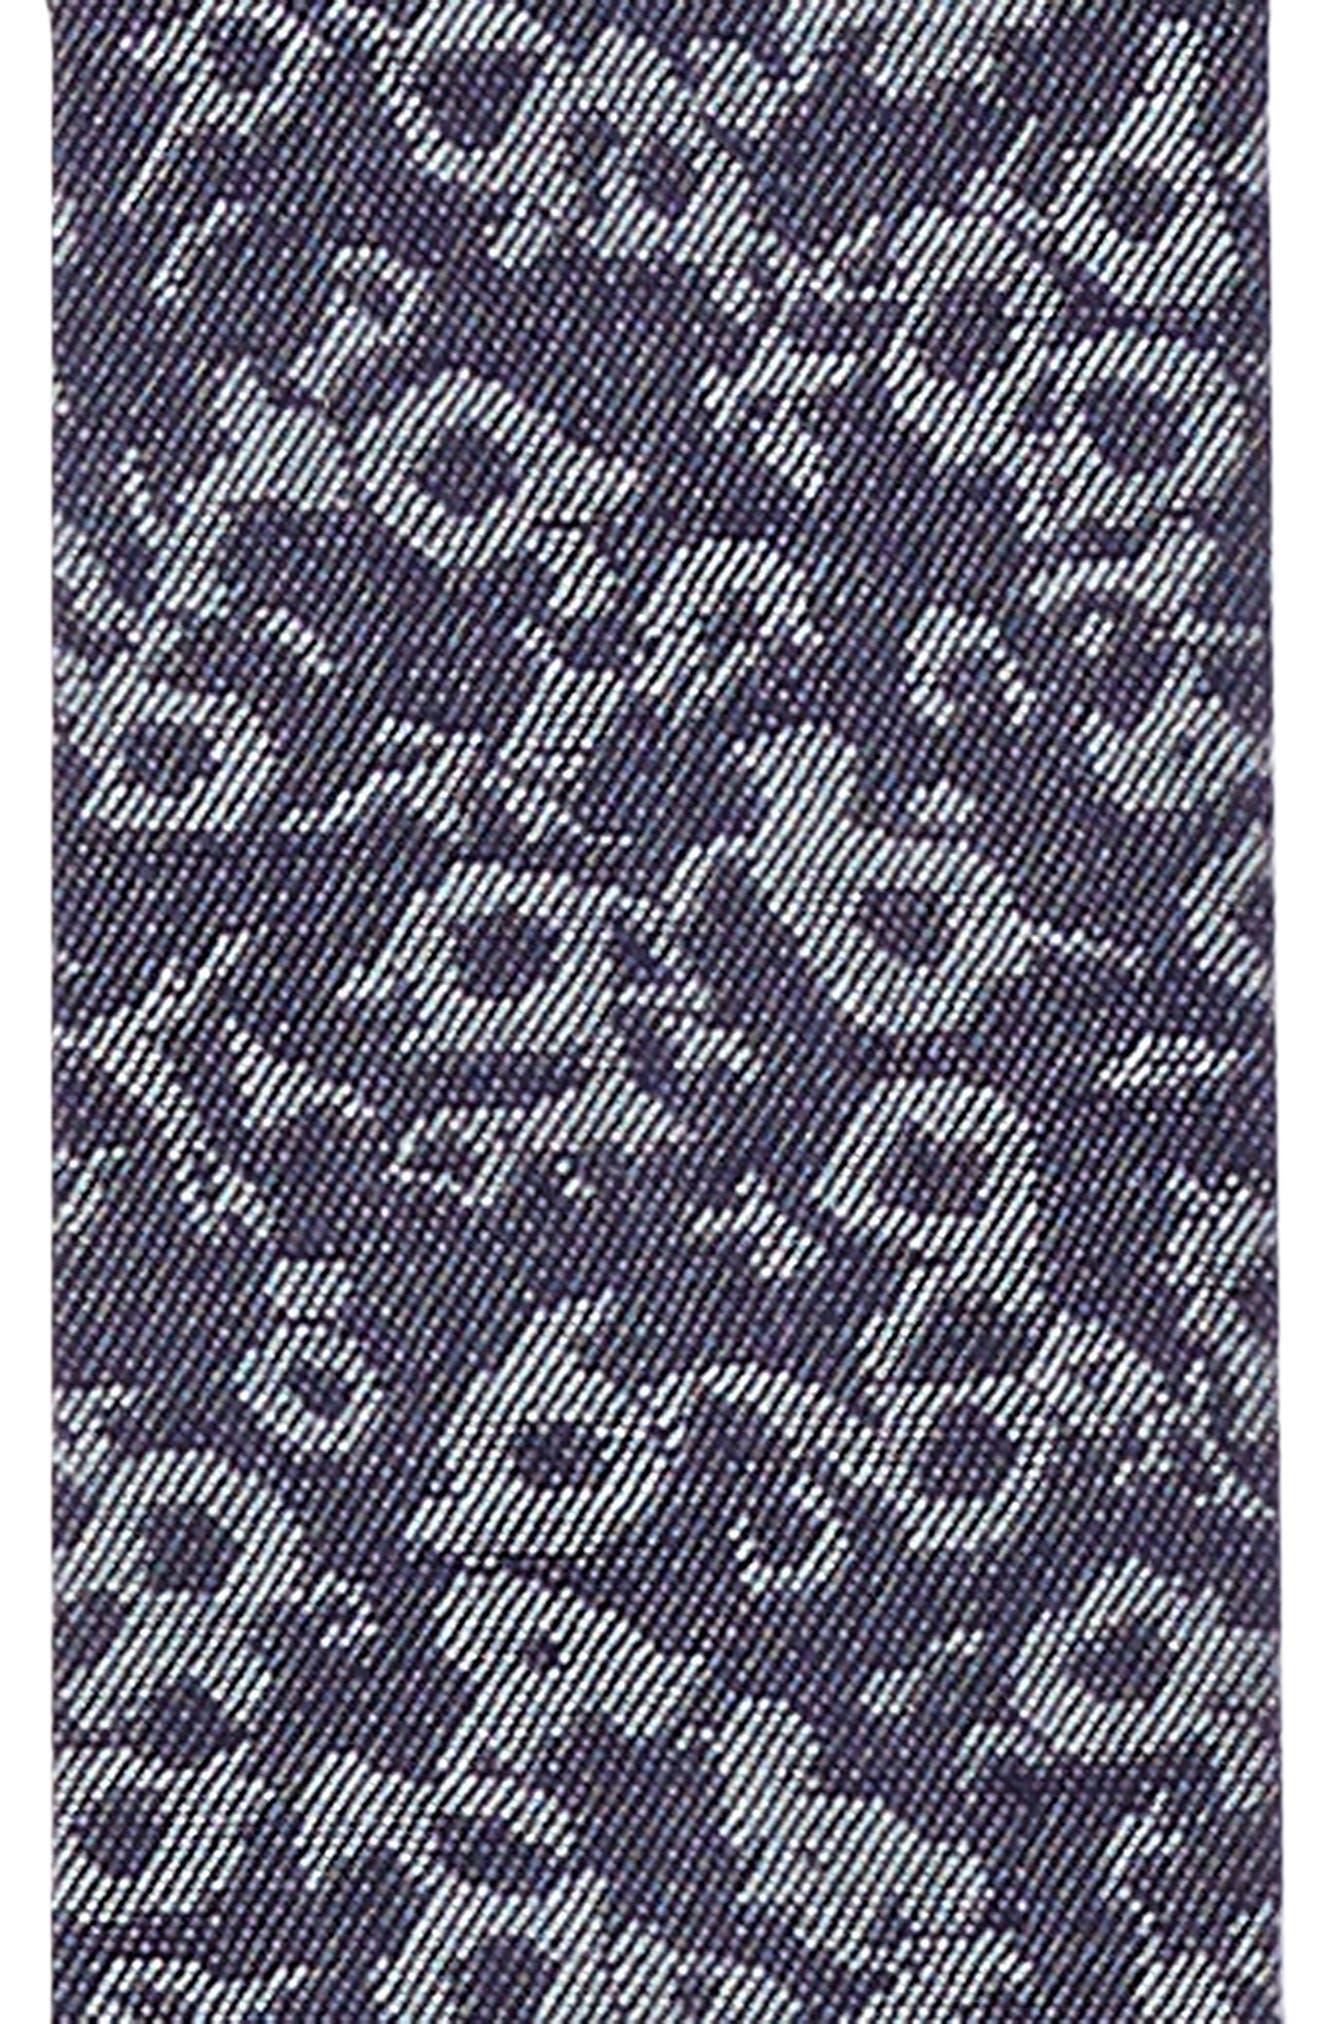 Floral Denim Suspenders,                             Alternate thumbnail 2, color,                             DENIM